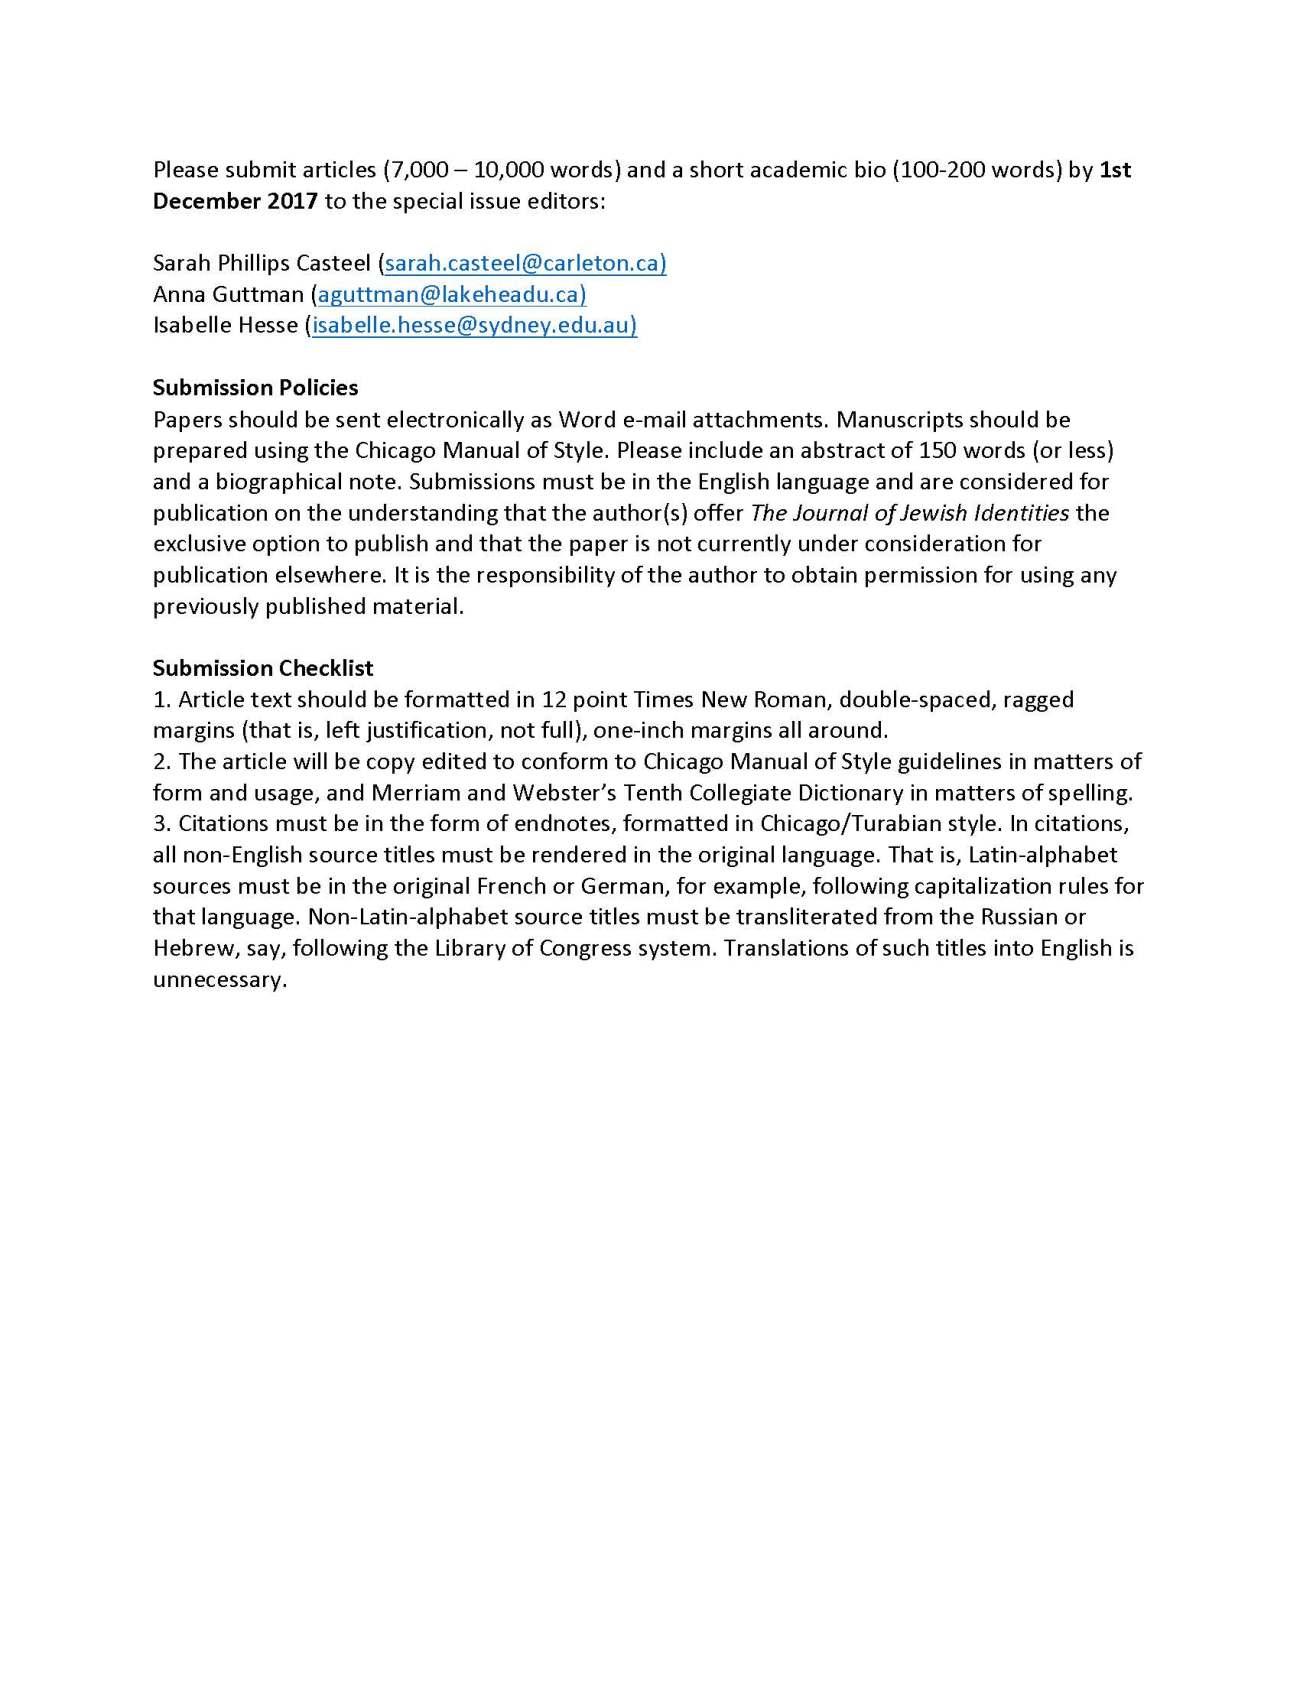 CFP - Jewishness and Postcoloniality_Page_2.jpg